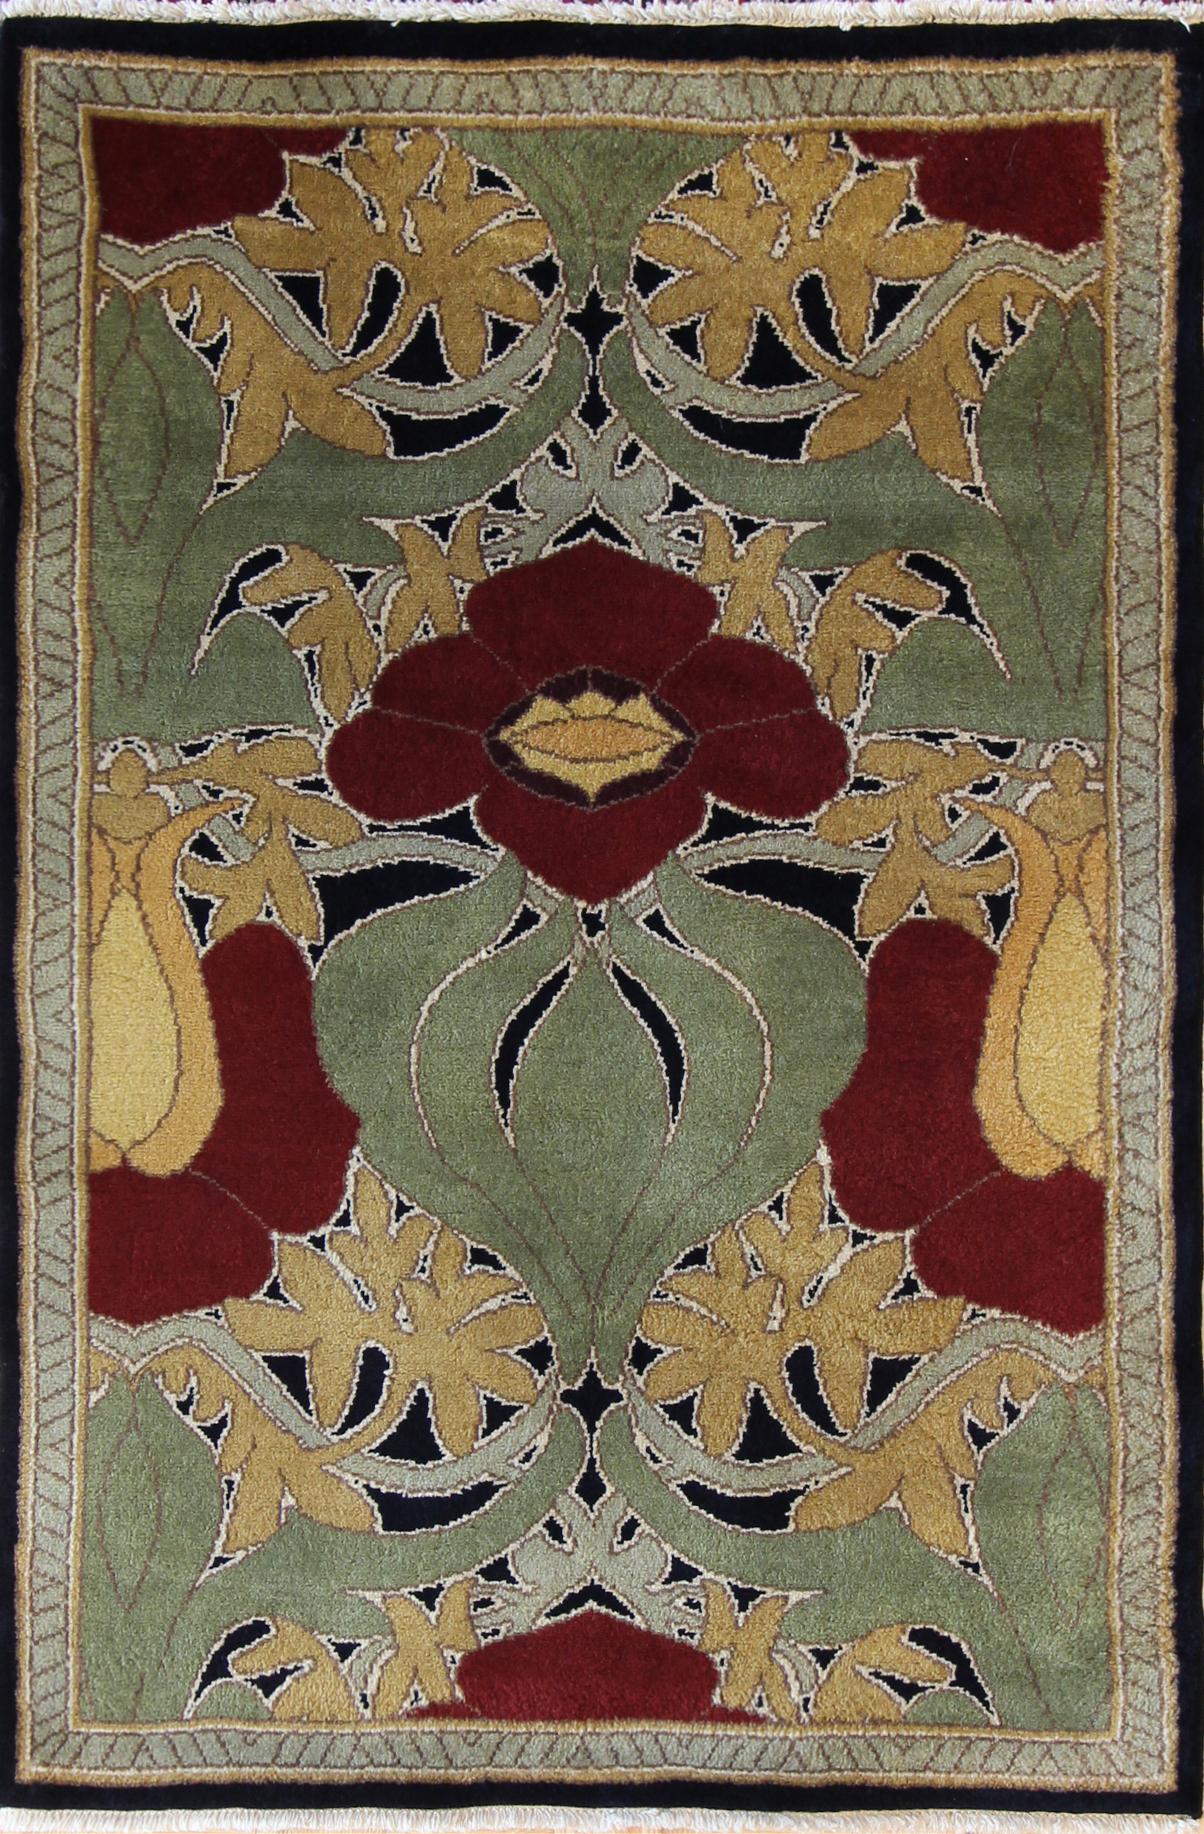 335 Donnemara, Voysey Design, India, New Zealand Wool, 4'x6'